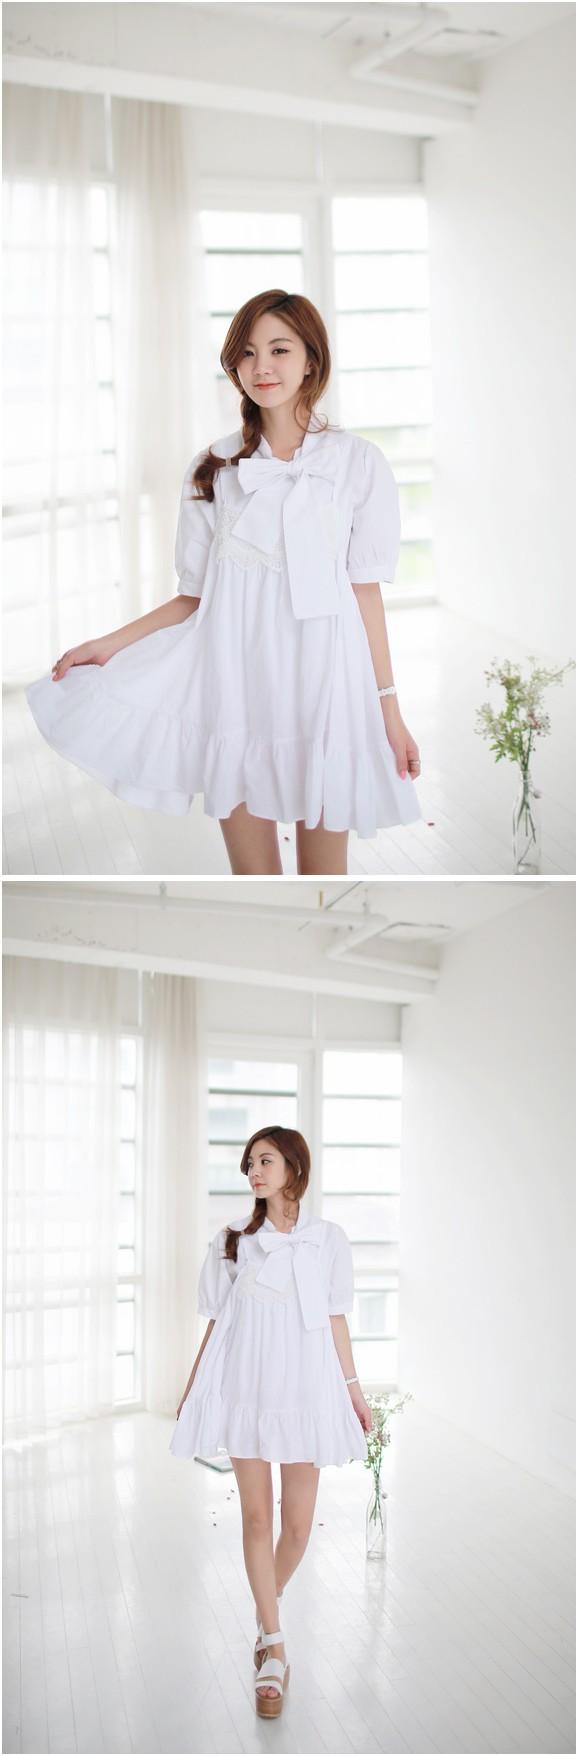 White girlish dress #dress #kooding